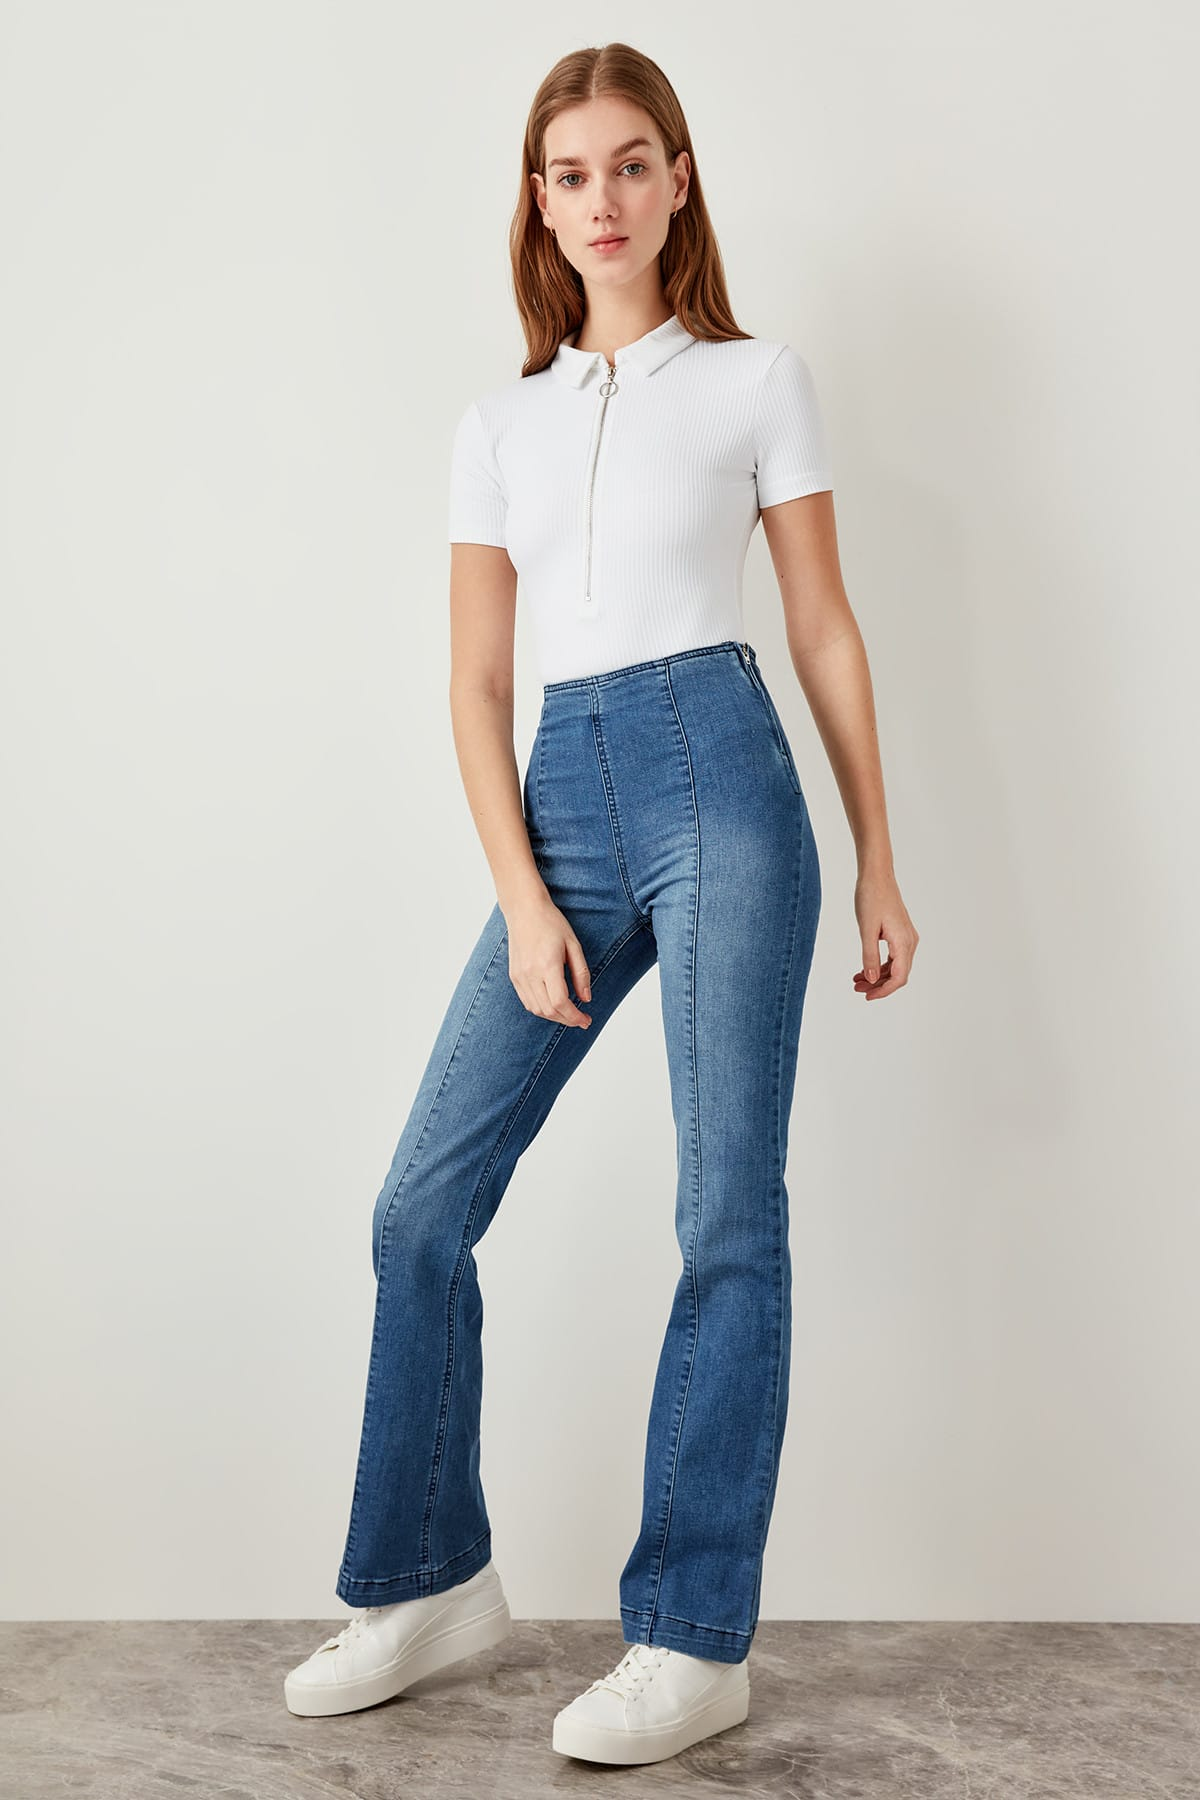 Trendyol Blue Jeans With High Waist Front Seam Detail Wide Leg Jeans F TCLSS19LR0033